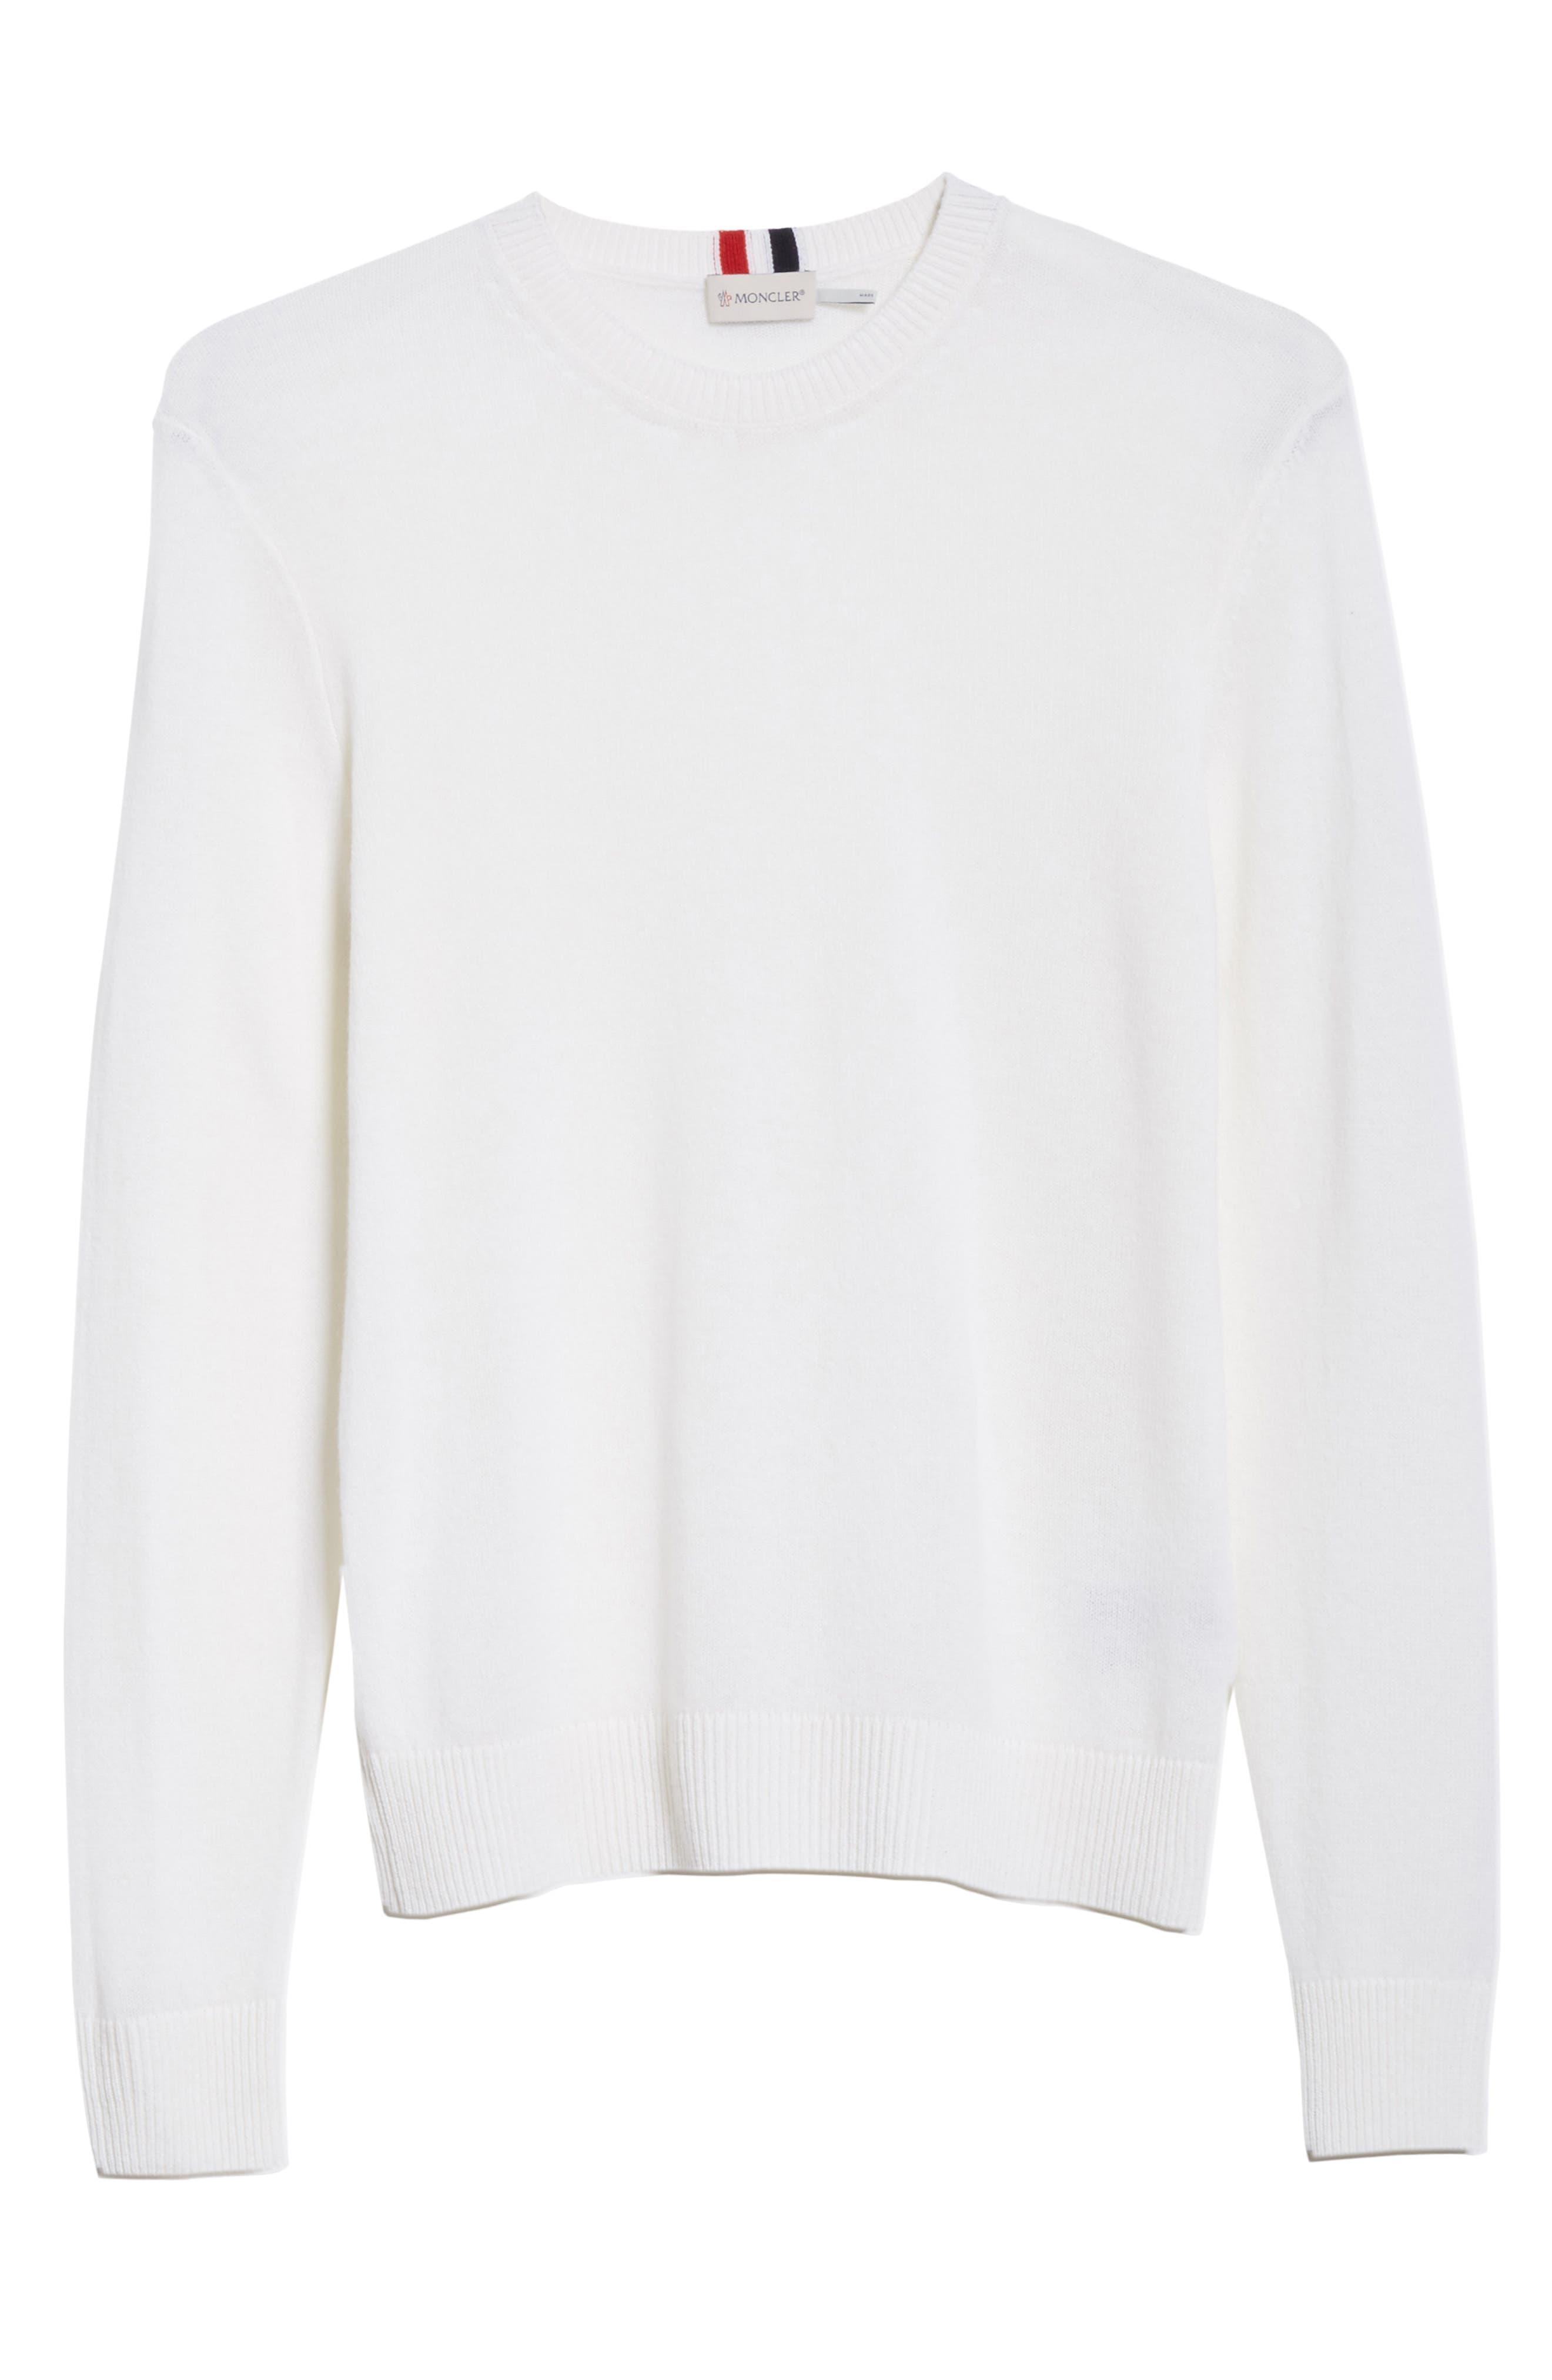 Cashmere Crewneck Sweater,                             Alternate thumbnail 6, color,                             White